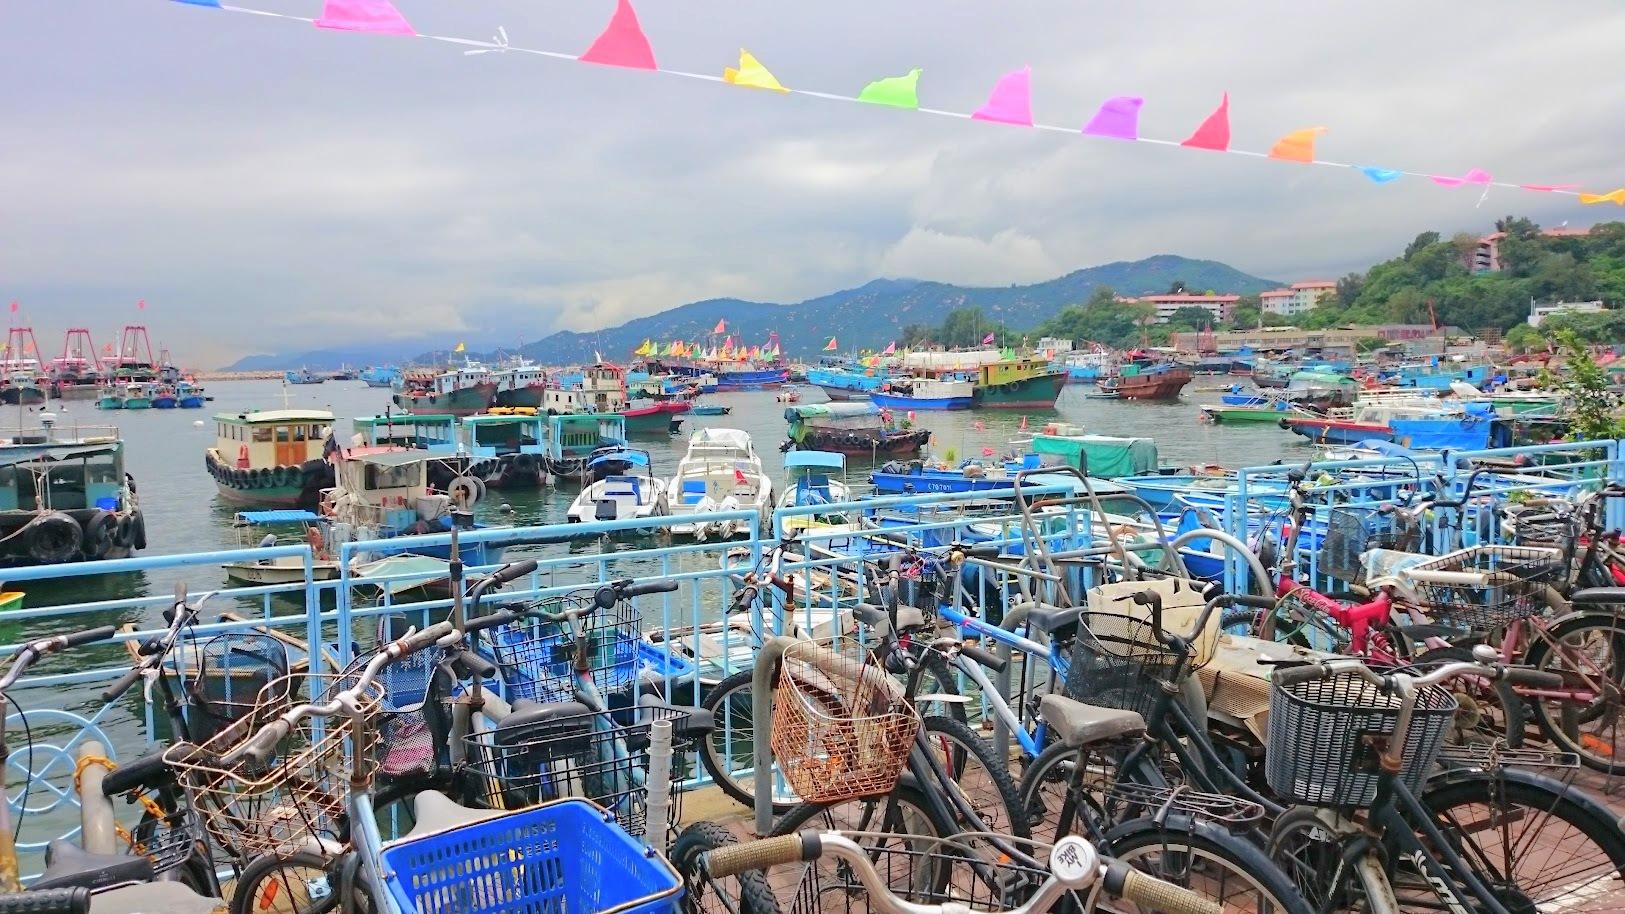 Cheung Chau hongkong saari nähtävyydet